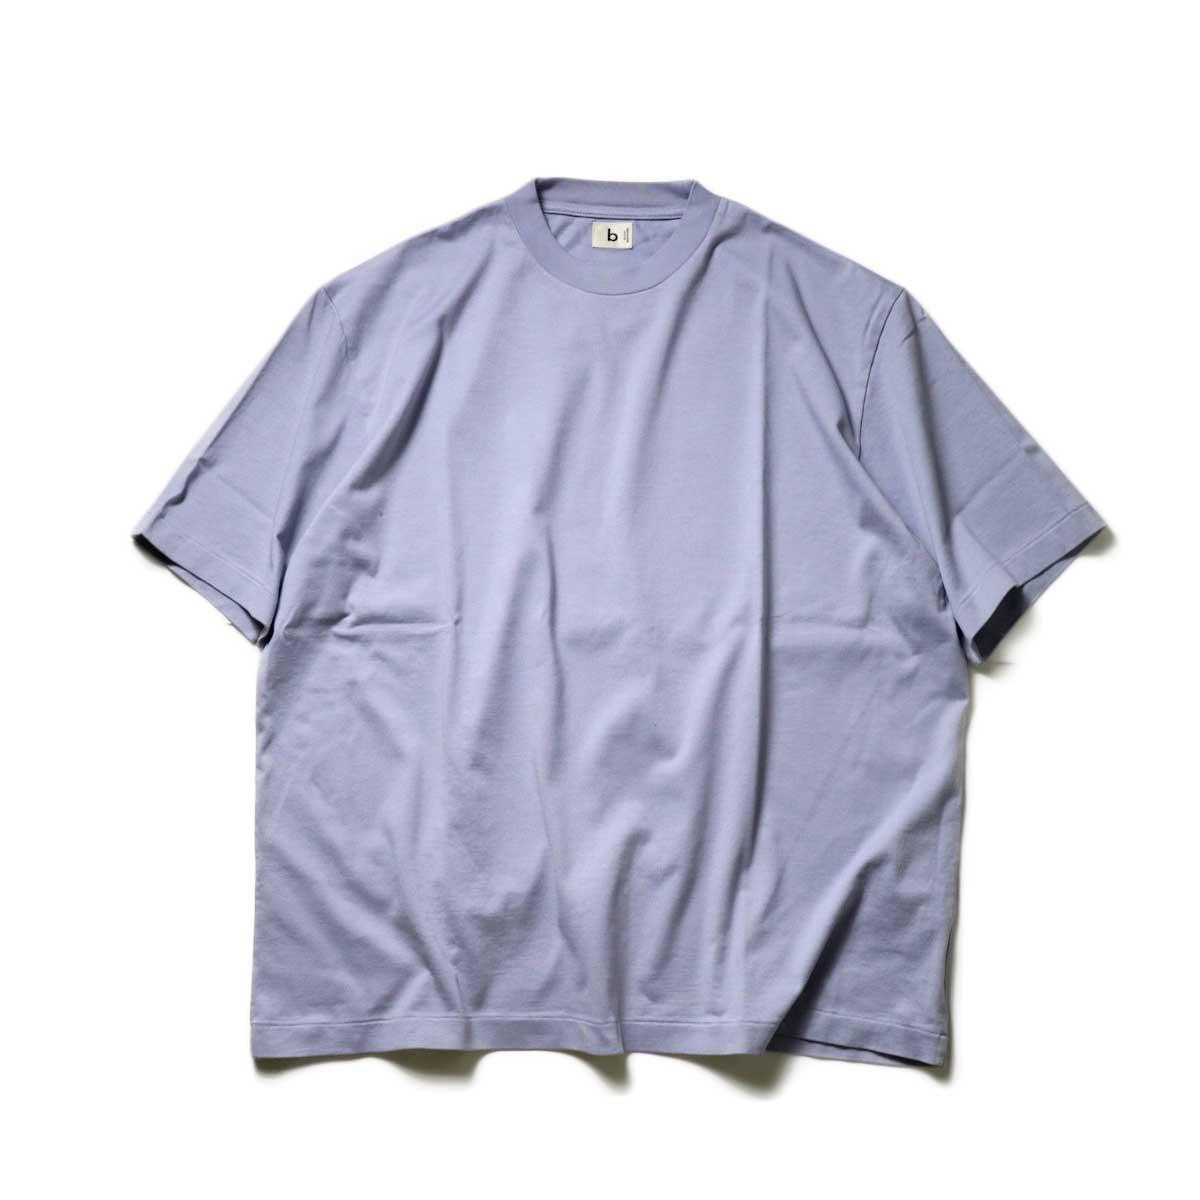 blurhms ROOTSTOCK / Extra Soft Tee BIG S/S (Light Purple)